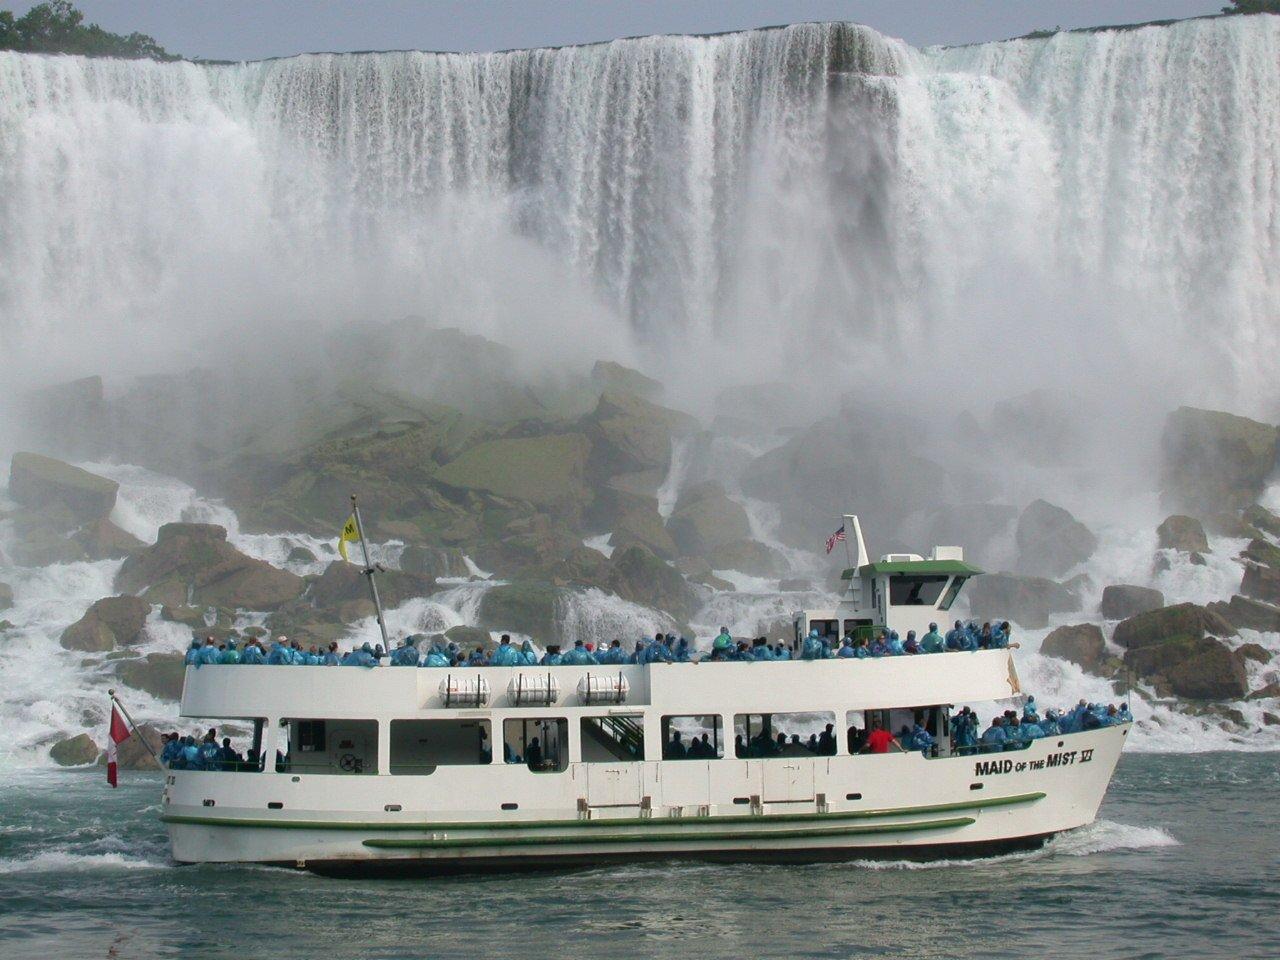 Niagara falls coupons maid of the mist